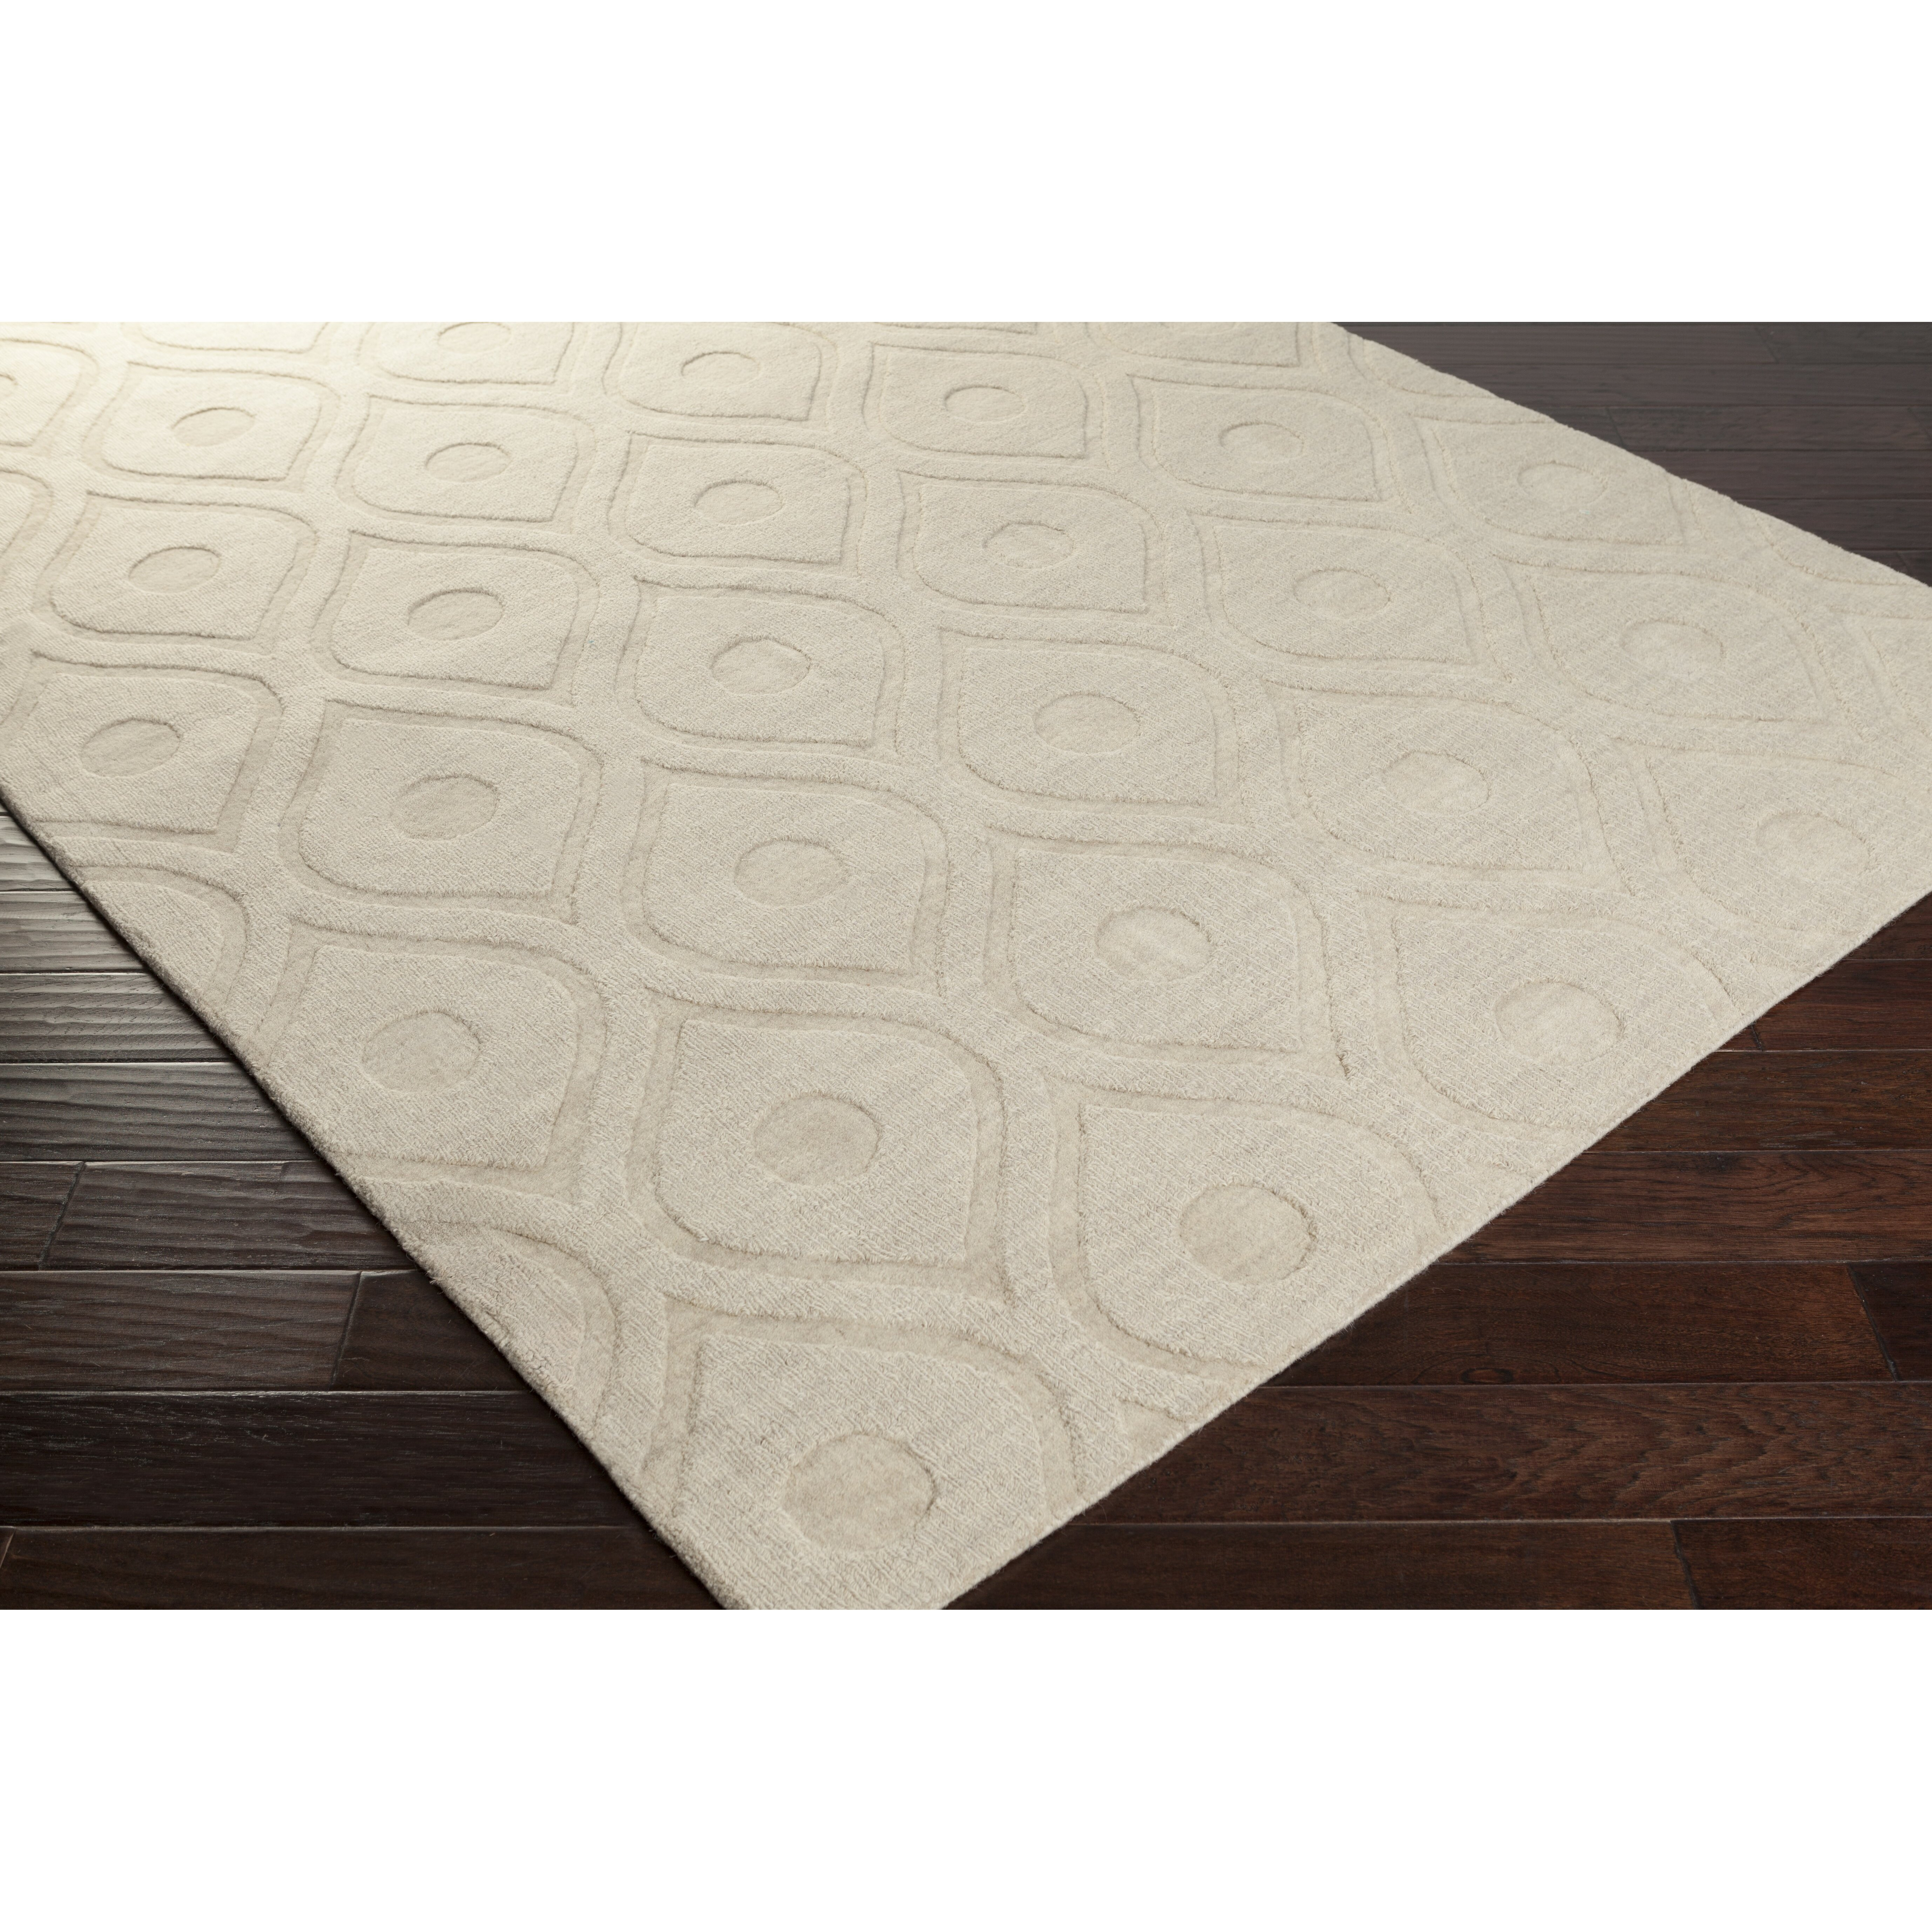 Artistic Weavers Central Park Ivory Geometric Zara Area